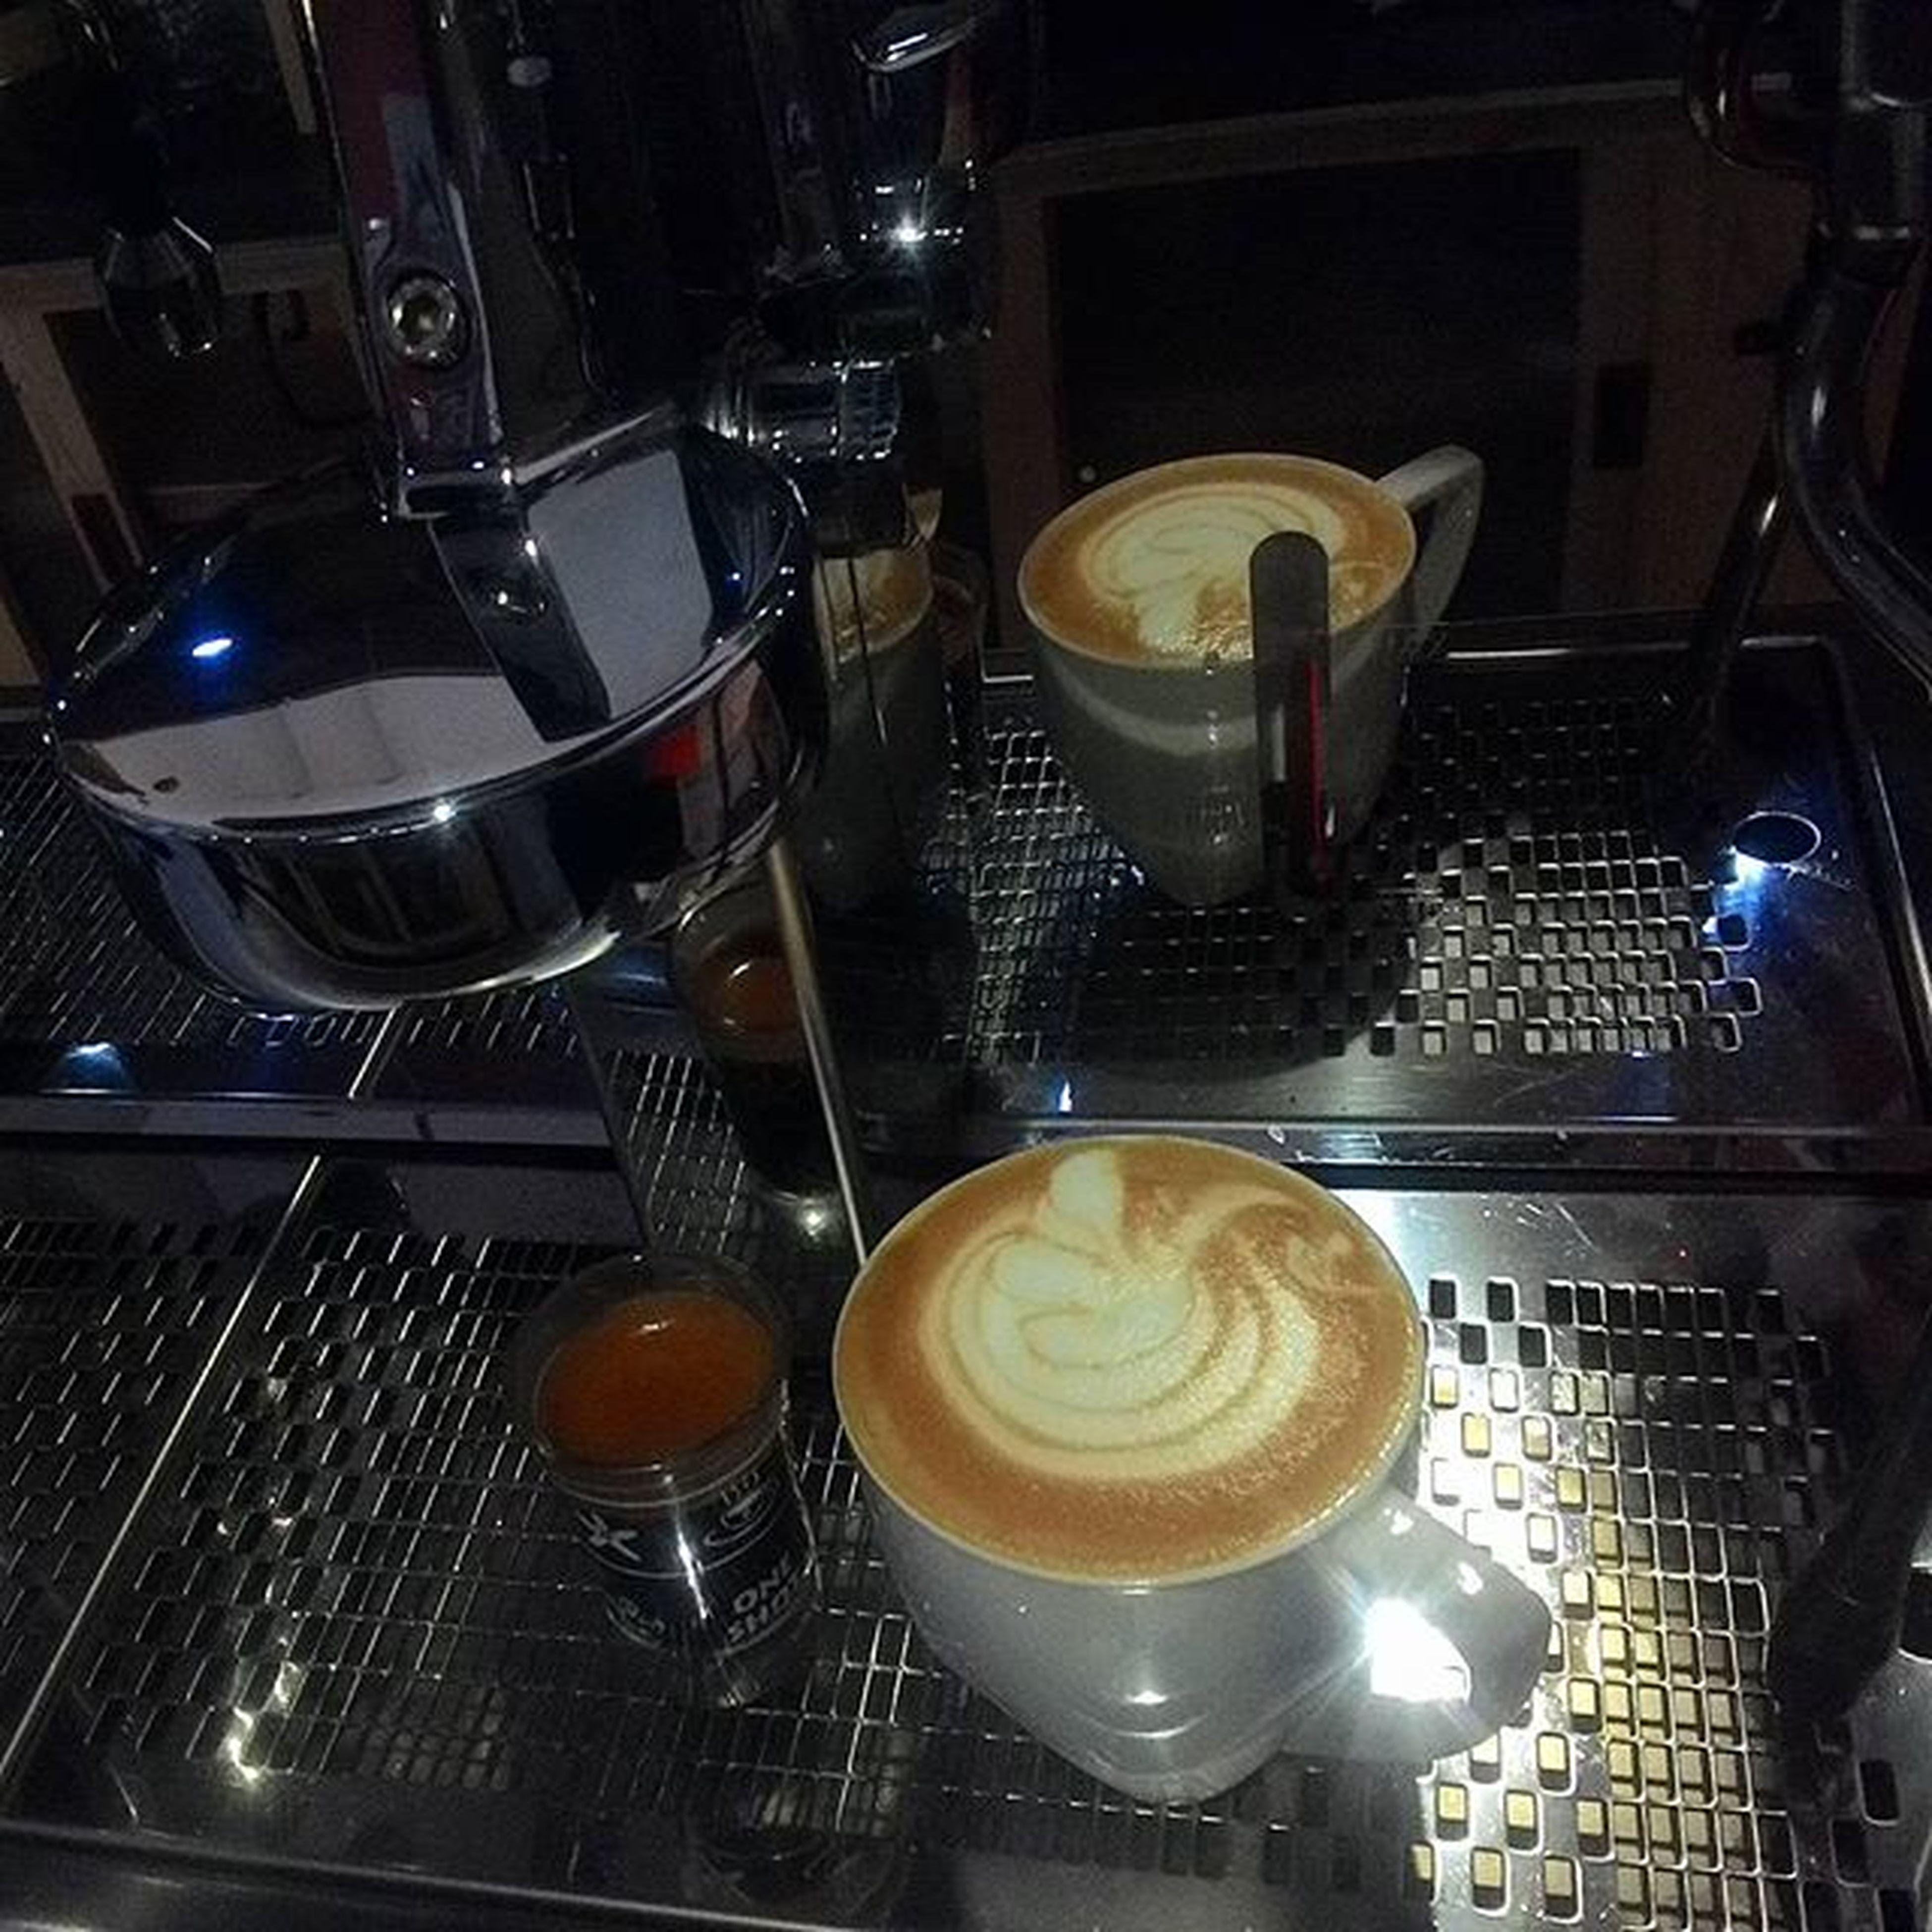 good morning s.o.p Cappuccino Cafedetiamo Latteart Latteartporn Barista Baristaproblems Baristacowboy Coffee Coffeeaddict Kopinusantara☕ Kopikankudus